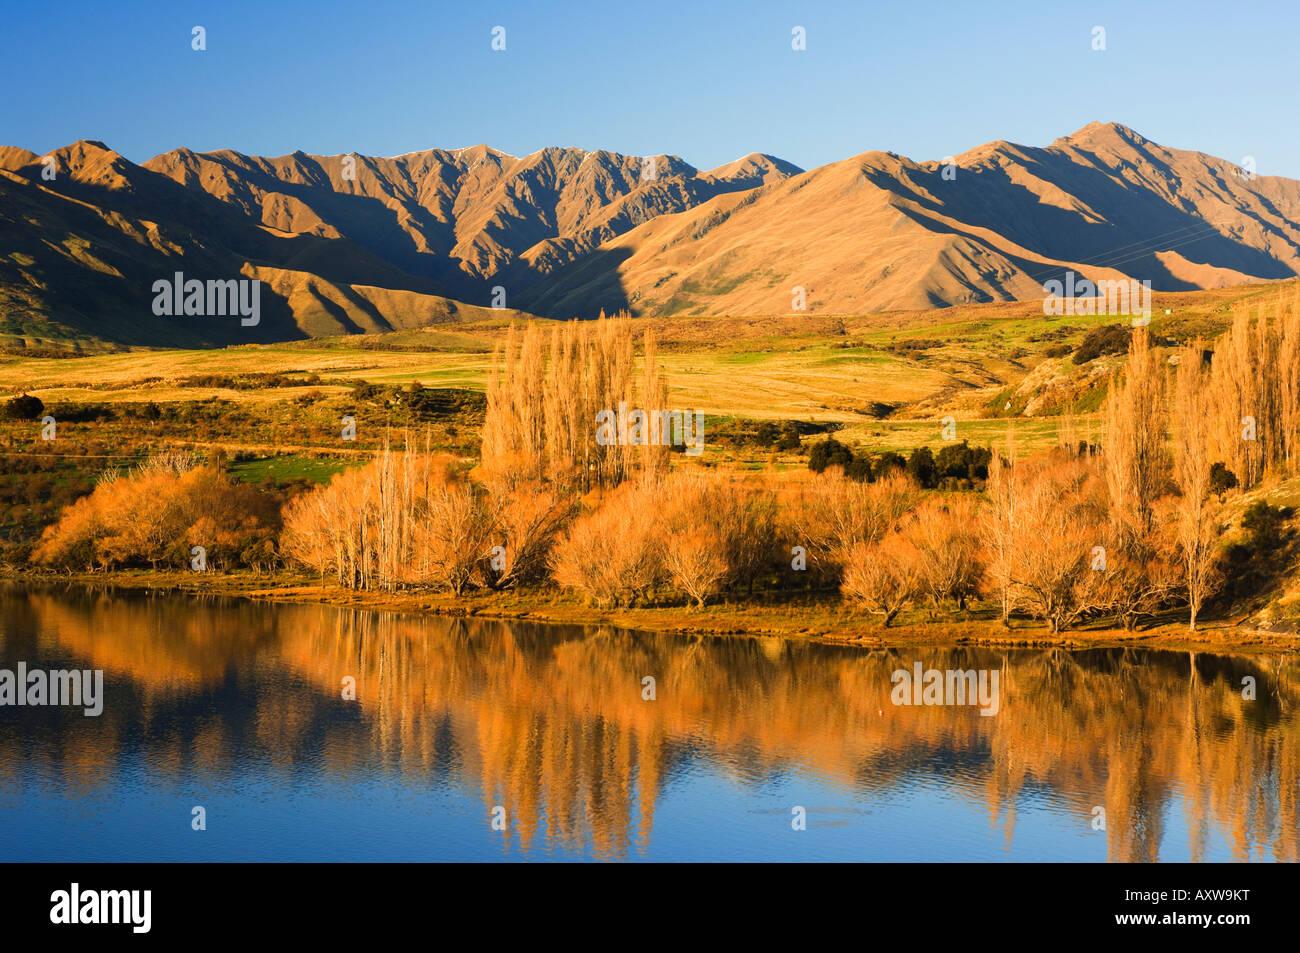 Glendhu Bay, Lake Wanaka, Wanaka, Central Otago, South Island, New Zealand, Pacific - Stock Image